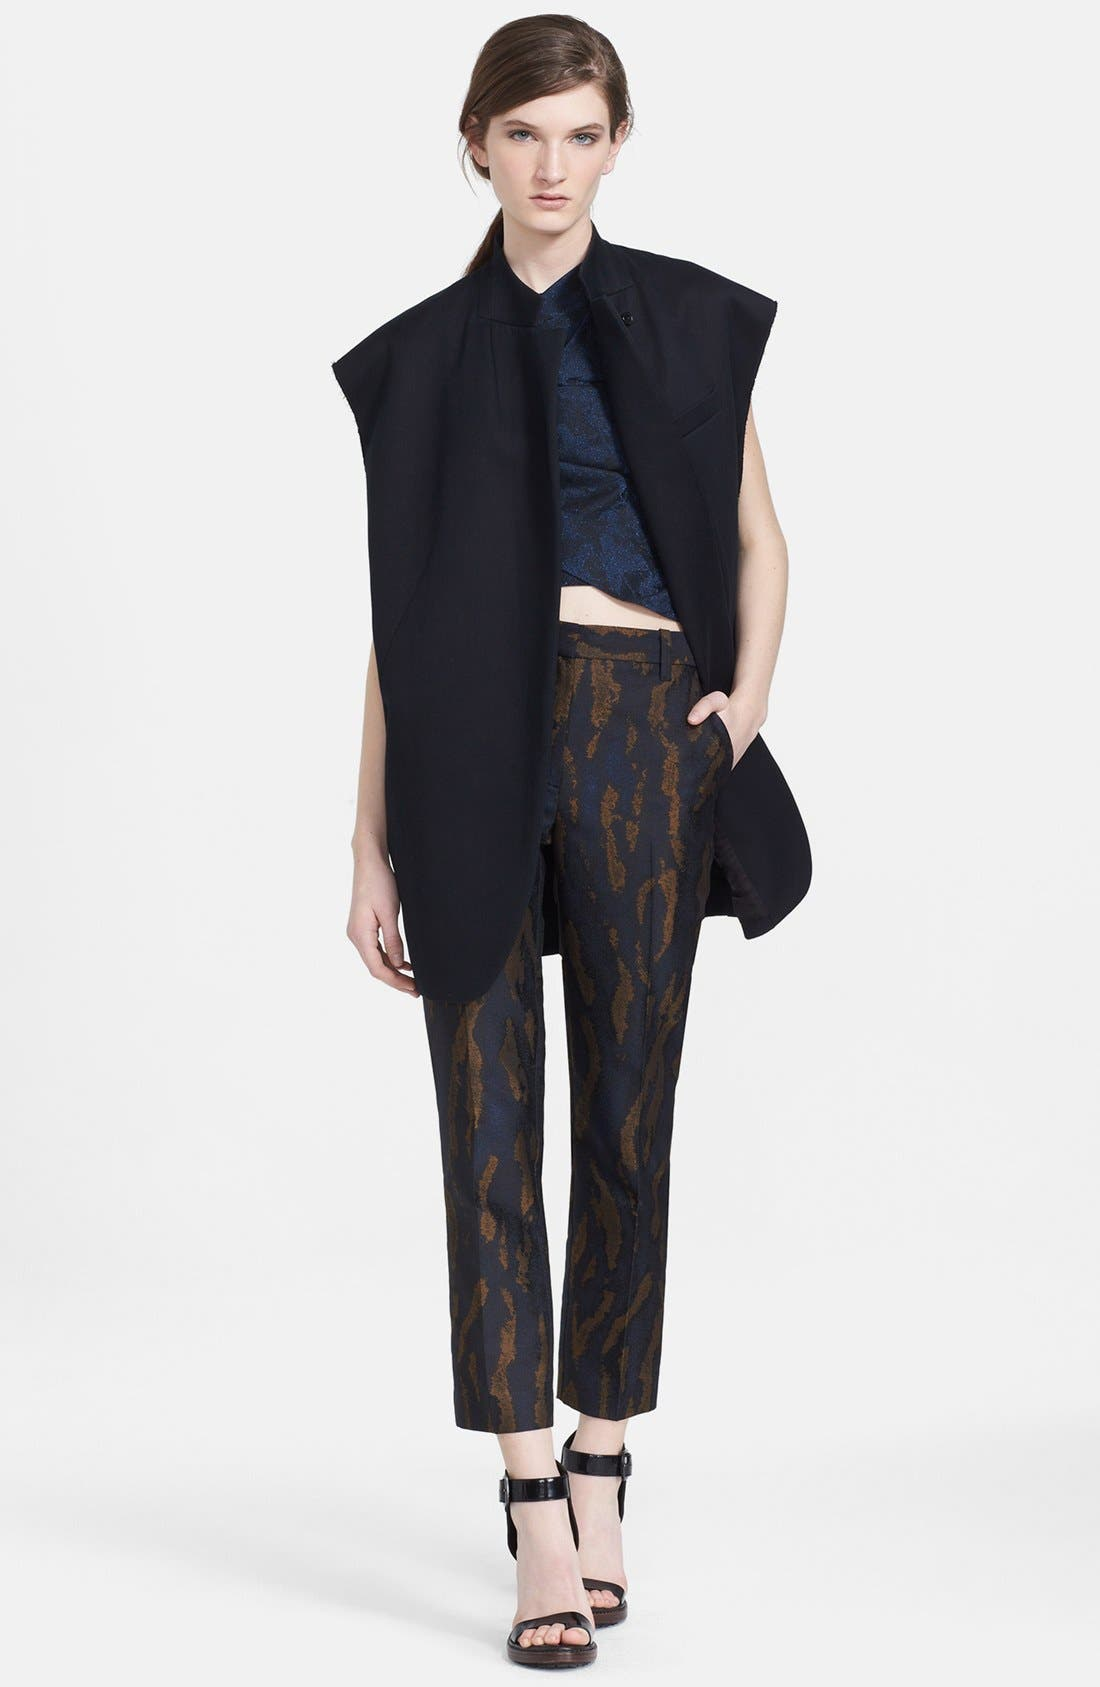 Alternate Image 1 Selected - 3.1 Phillip Lim Oversized Dolman Sleeve Vest